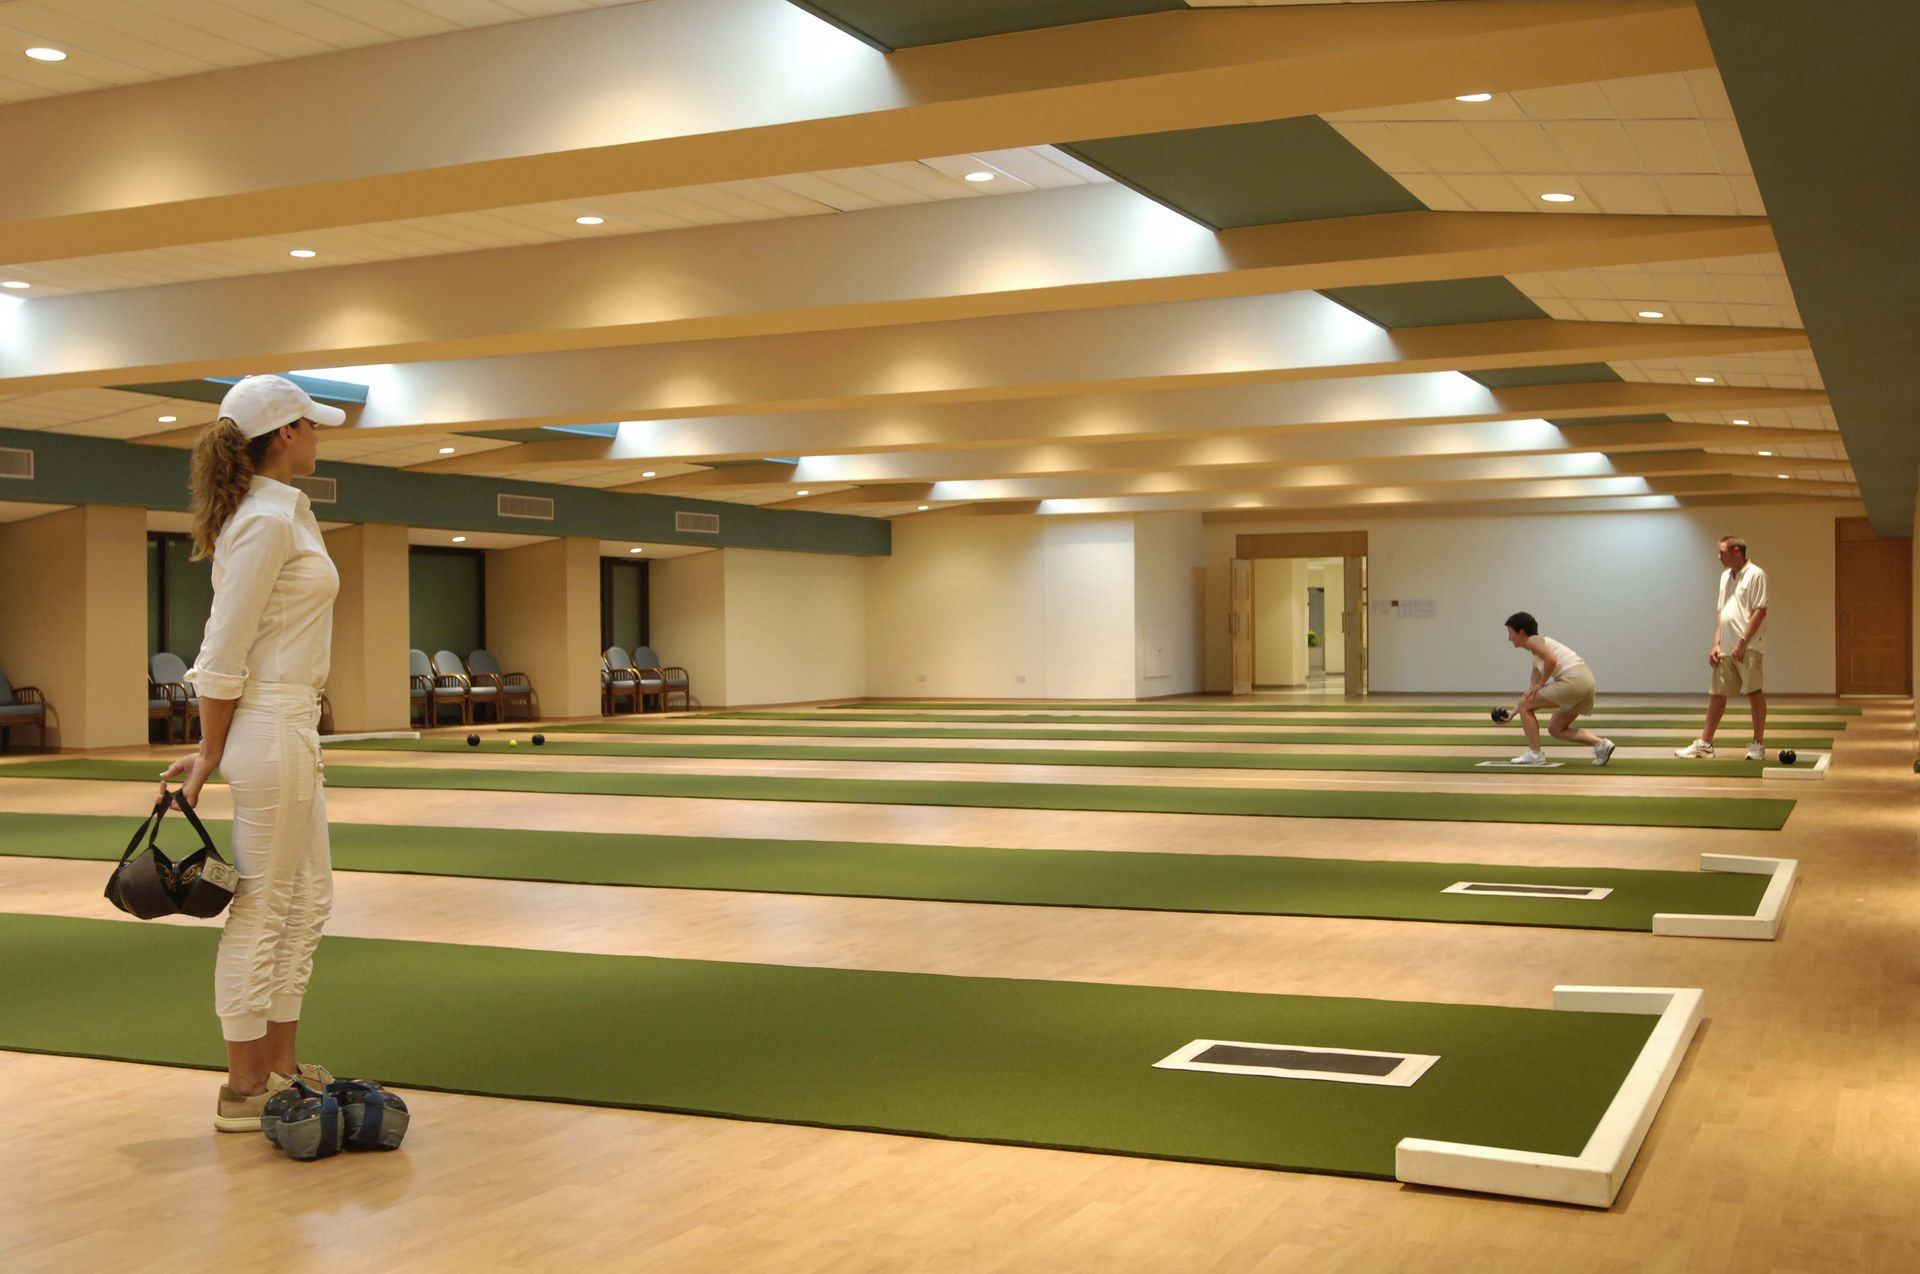 _53 athena royal beach hotel artemis hall short mat bowls_resized